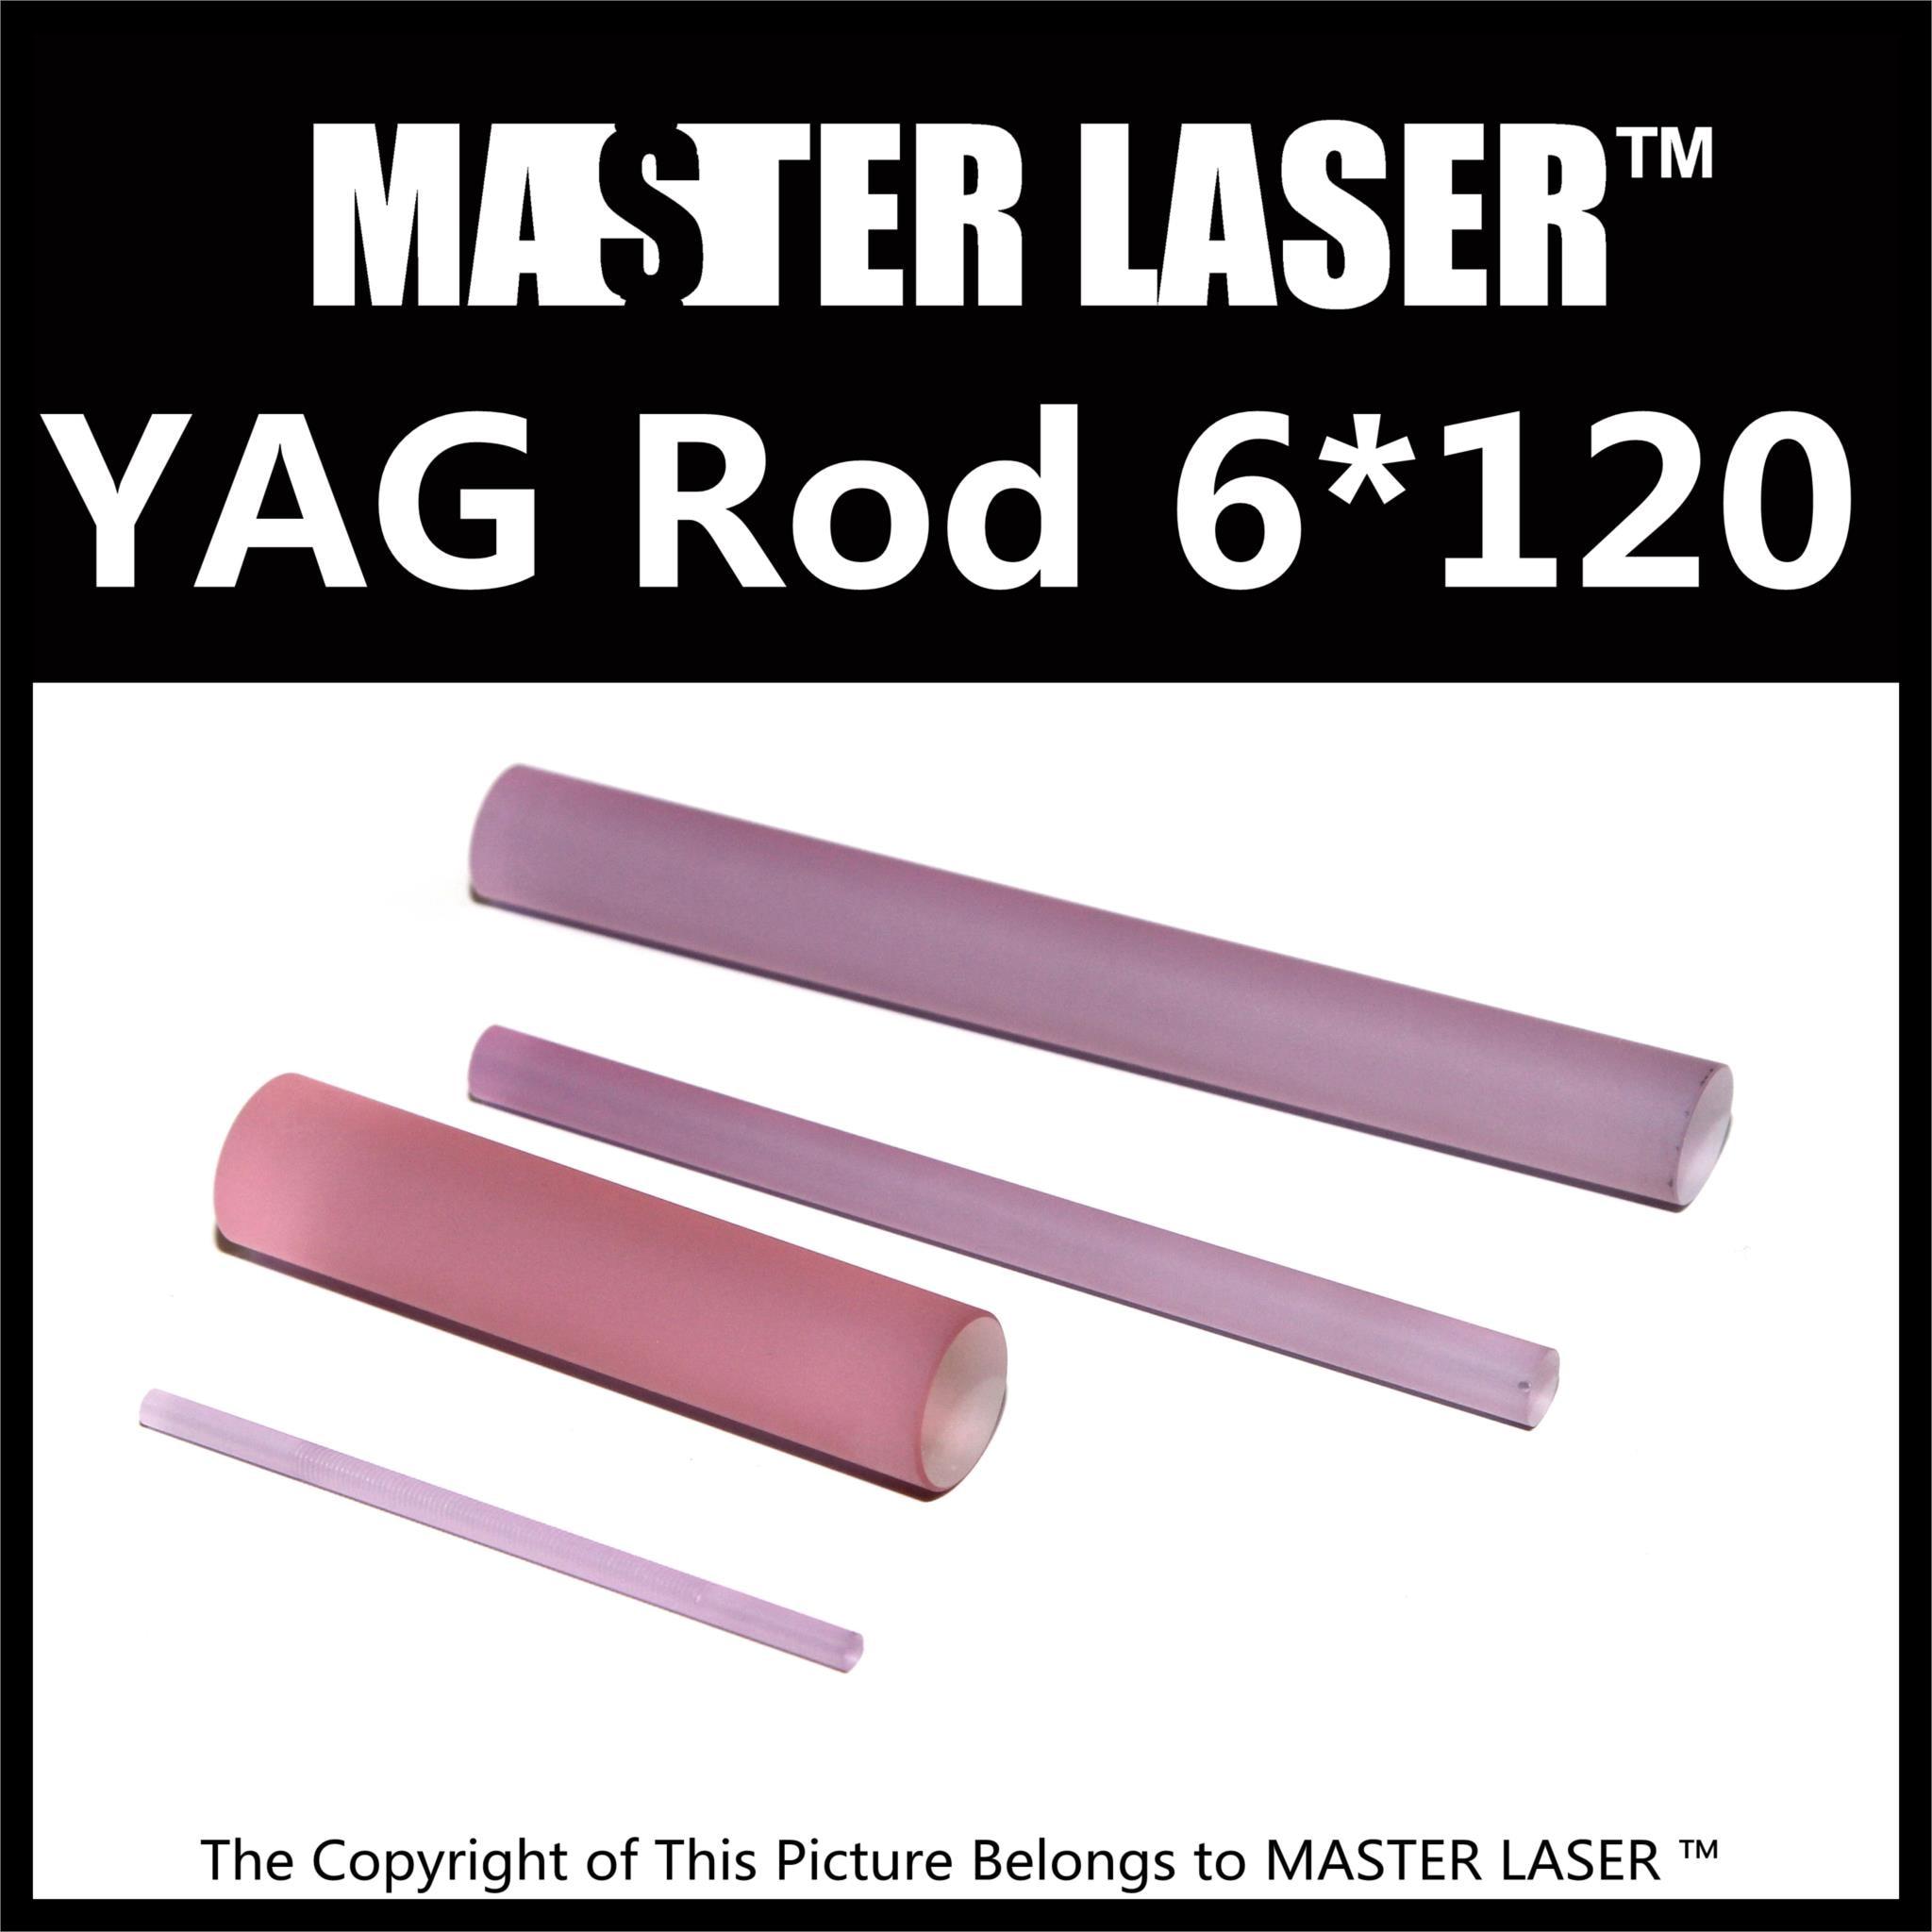 Good Quality Laser Welding Machine 1064nm nd: Yag Rod 6mm Dia 120mm Length nd: Yag Laser Rod laser welding cutting engraving machine laser protection lens 1064nm yag 39 1 5